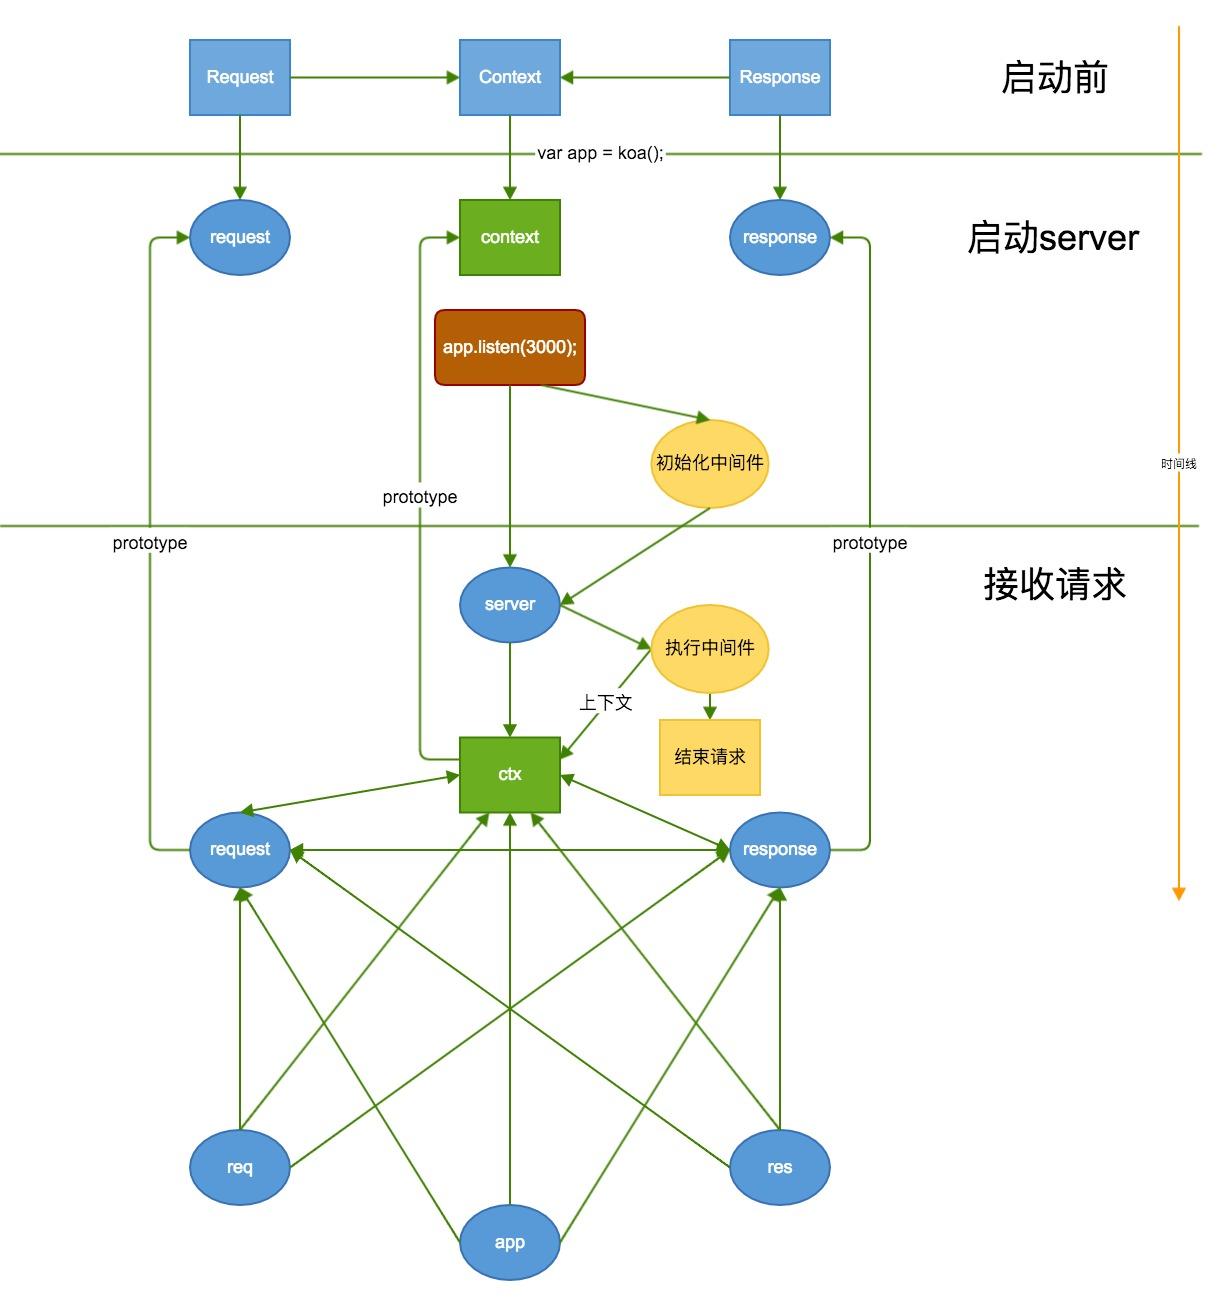 koa总体流程图